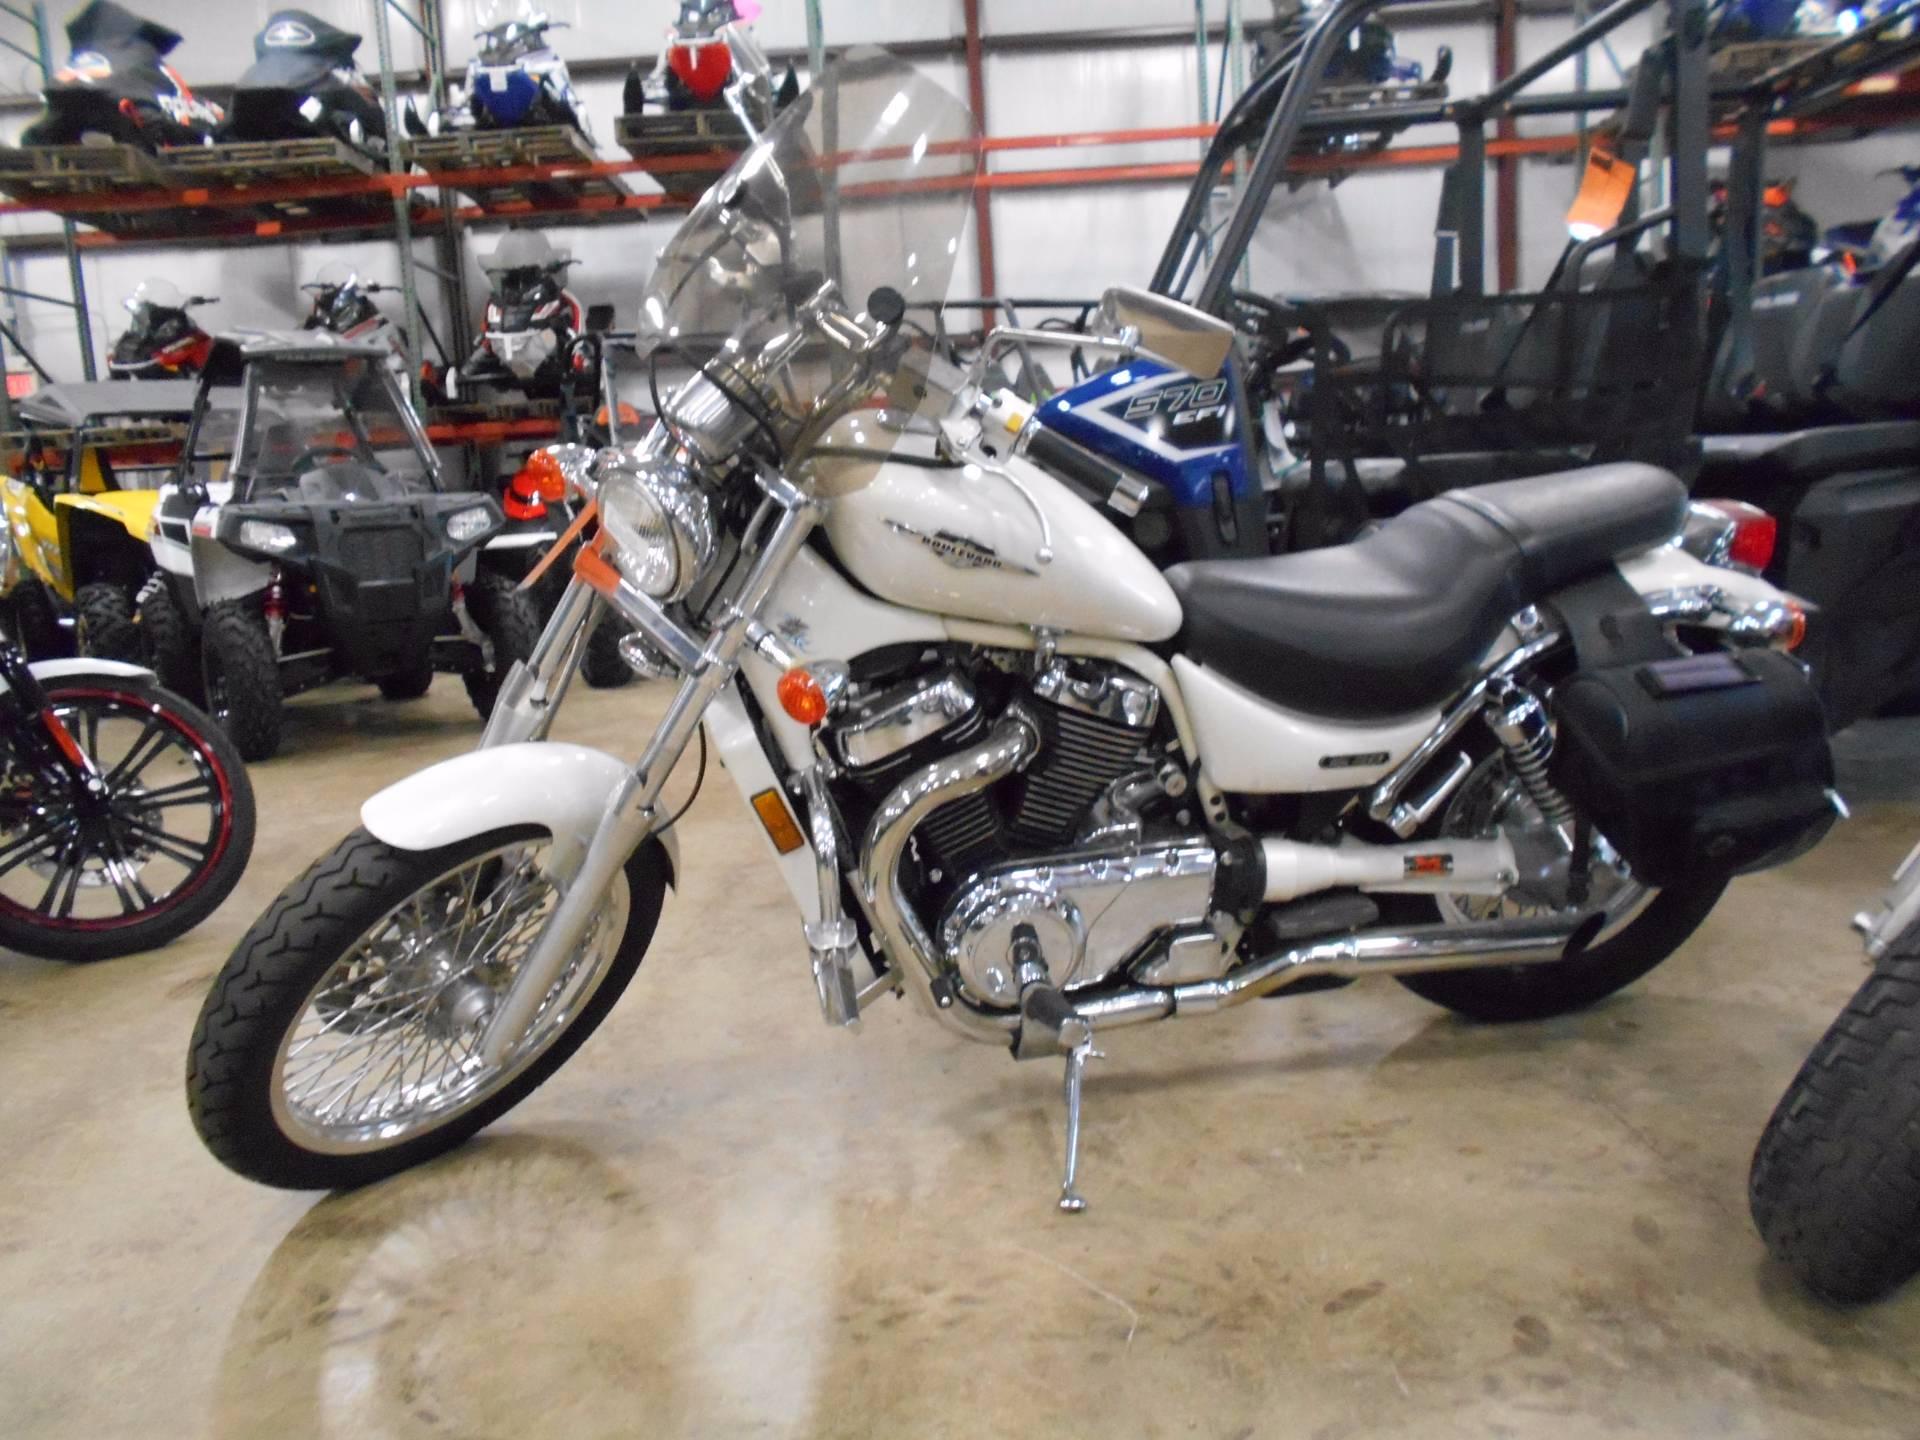 Used 2007 Suzuki Boulevard S50 Motorcycles in Belvidere, IL